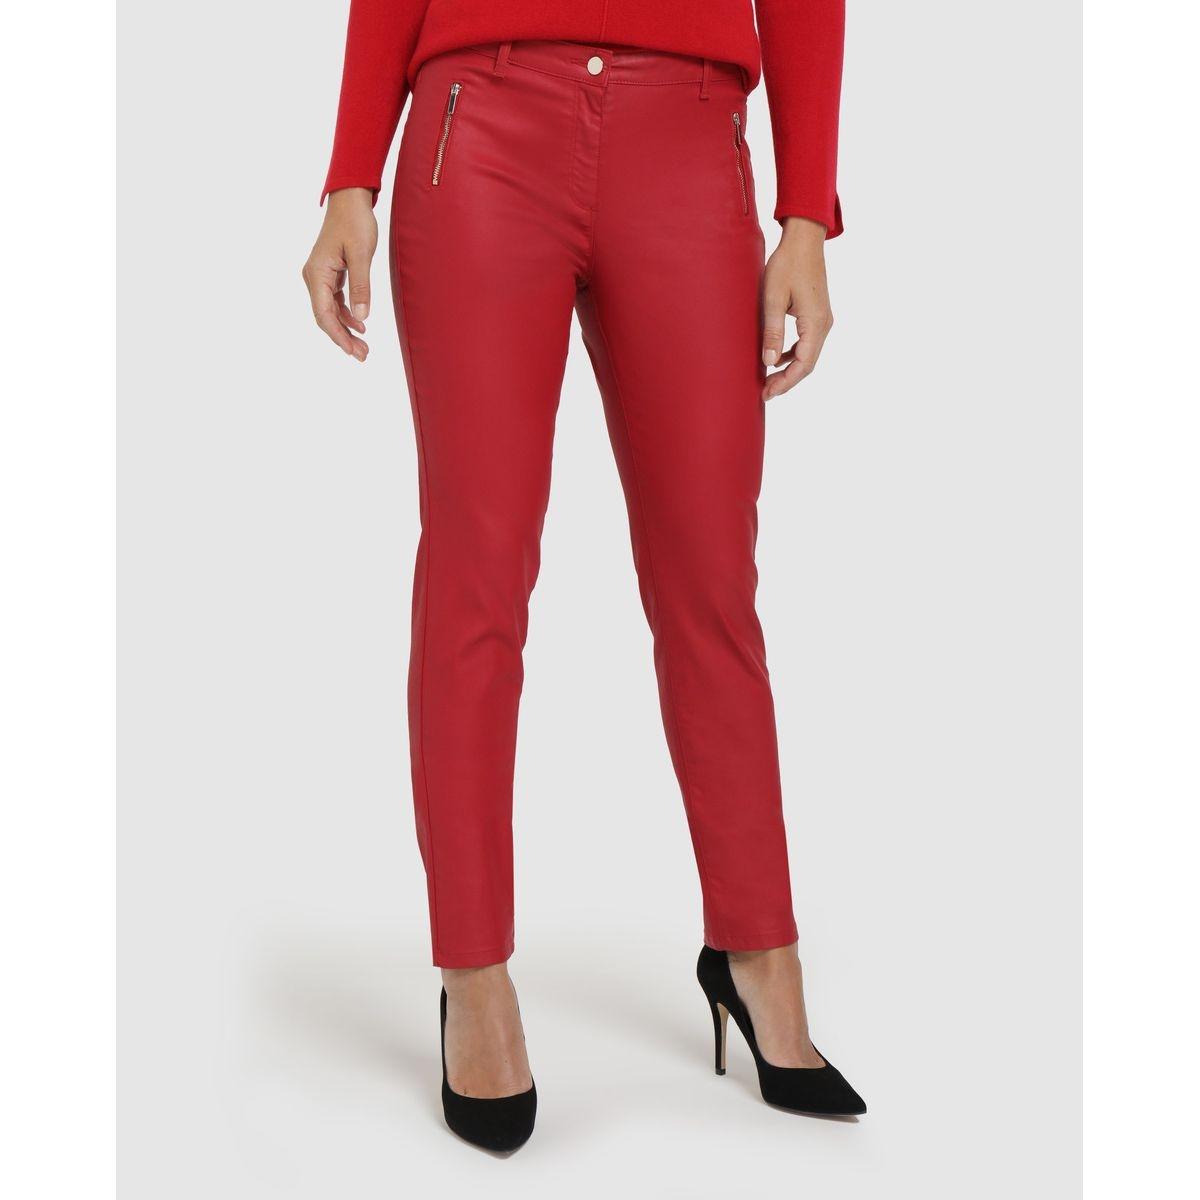 Pantalon avec poches zippées